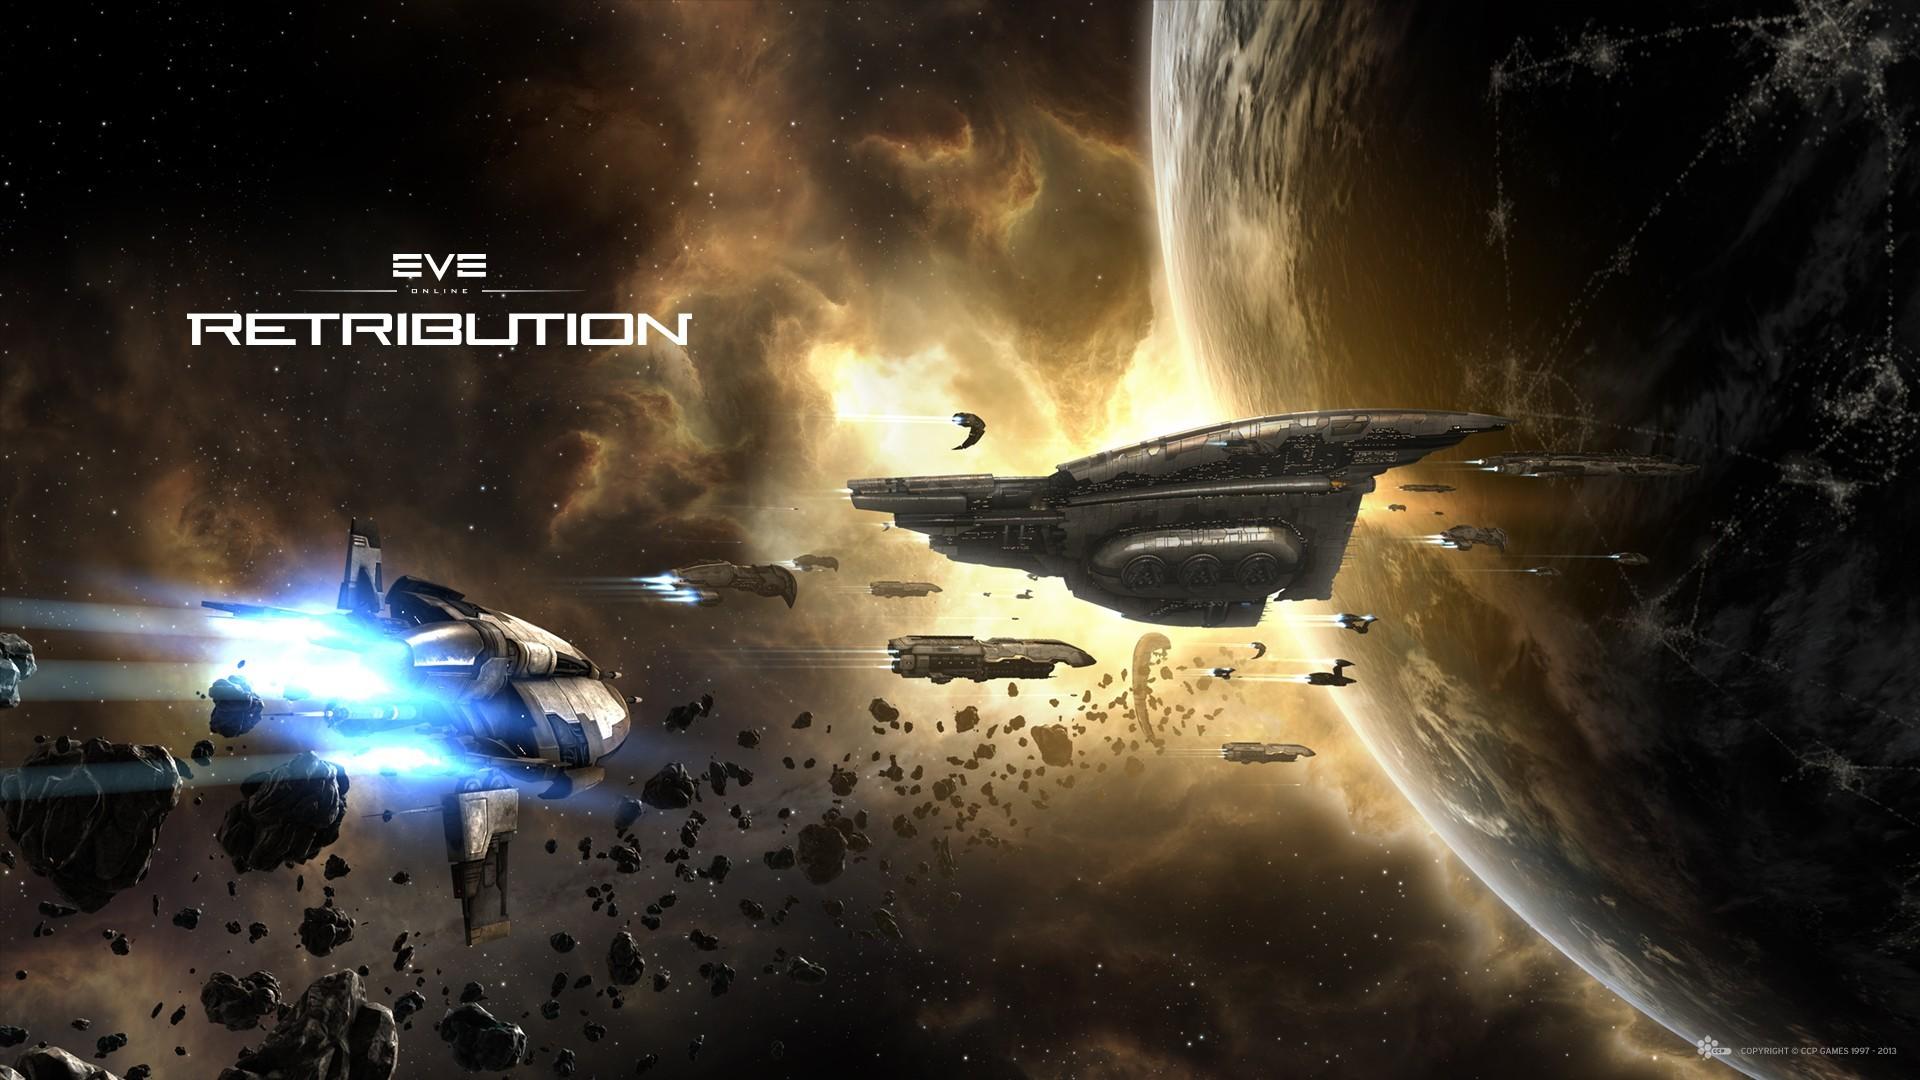 Eve online desktop wallpapers hd 73 images - Spaceship wallpaper ...